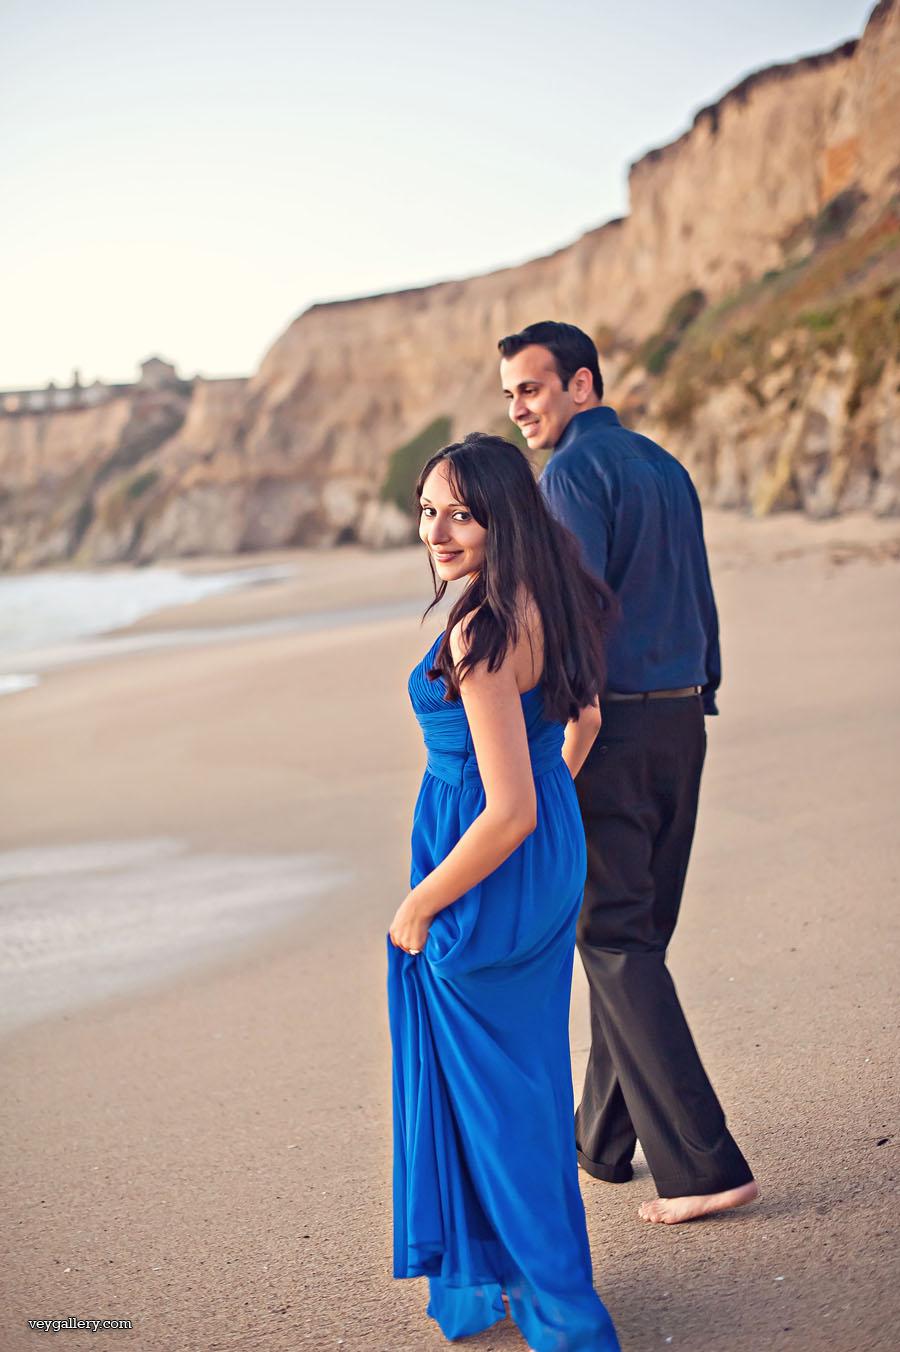 The-Ritz-Carlton-Half-Moon-Bay-Engagement-Photography-0015.jpg